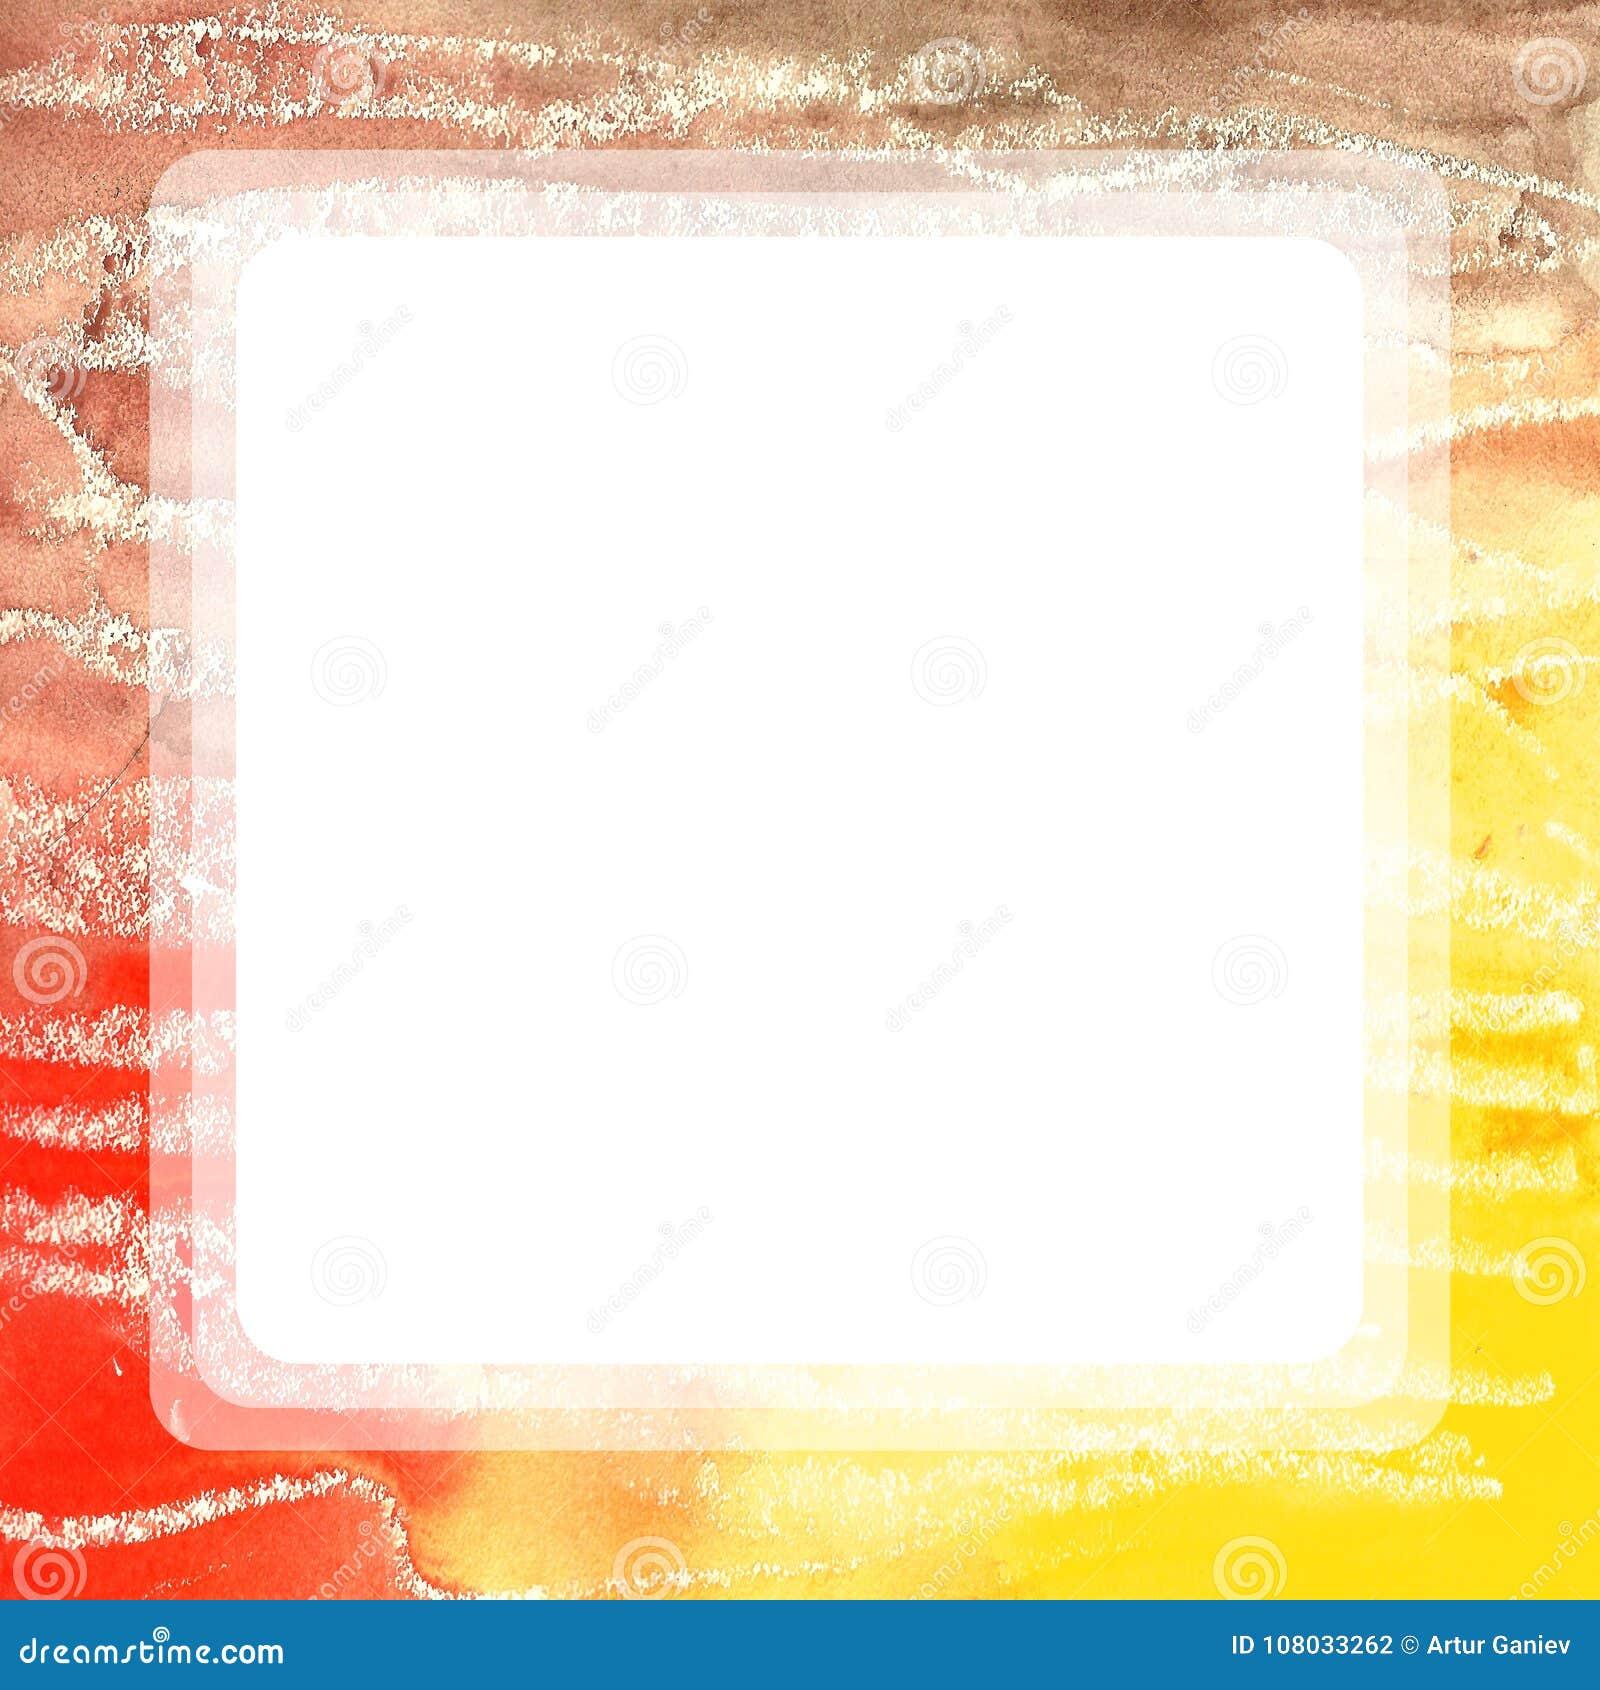 Square Watercolor Frame Handmade. Stock Illustration - Illustration ...